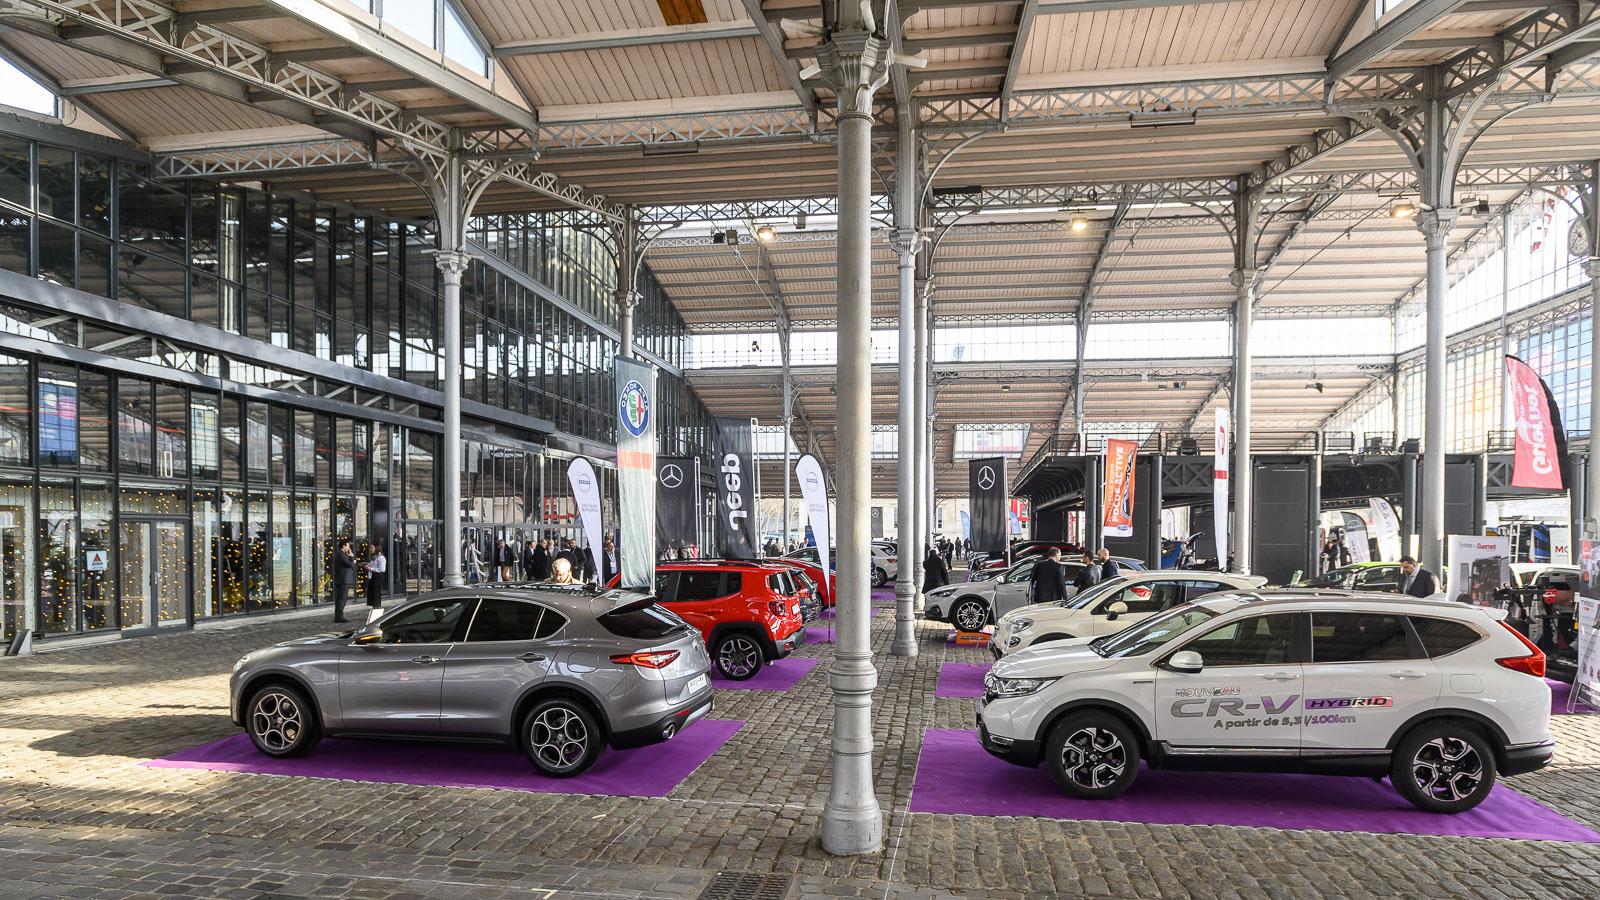 Rencontres Flottes Automobiles 2019 Exposition véhicules